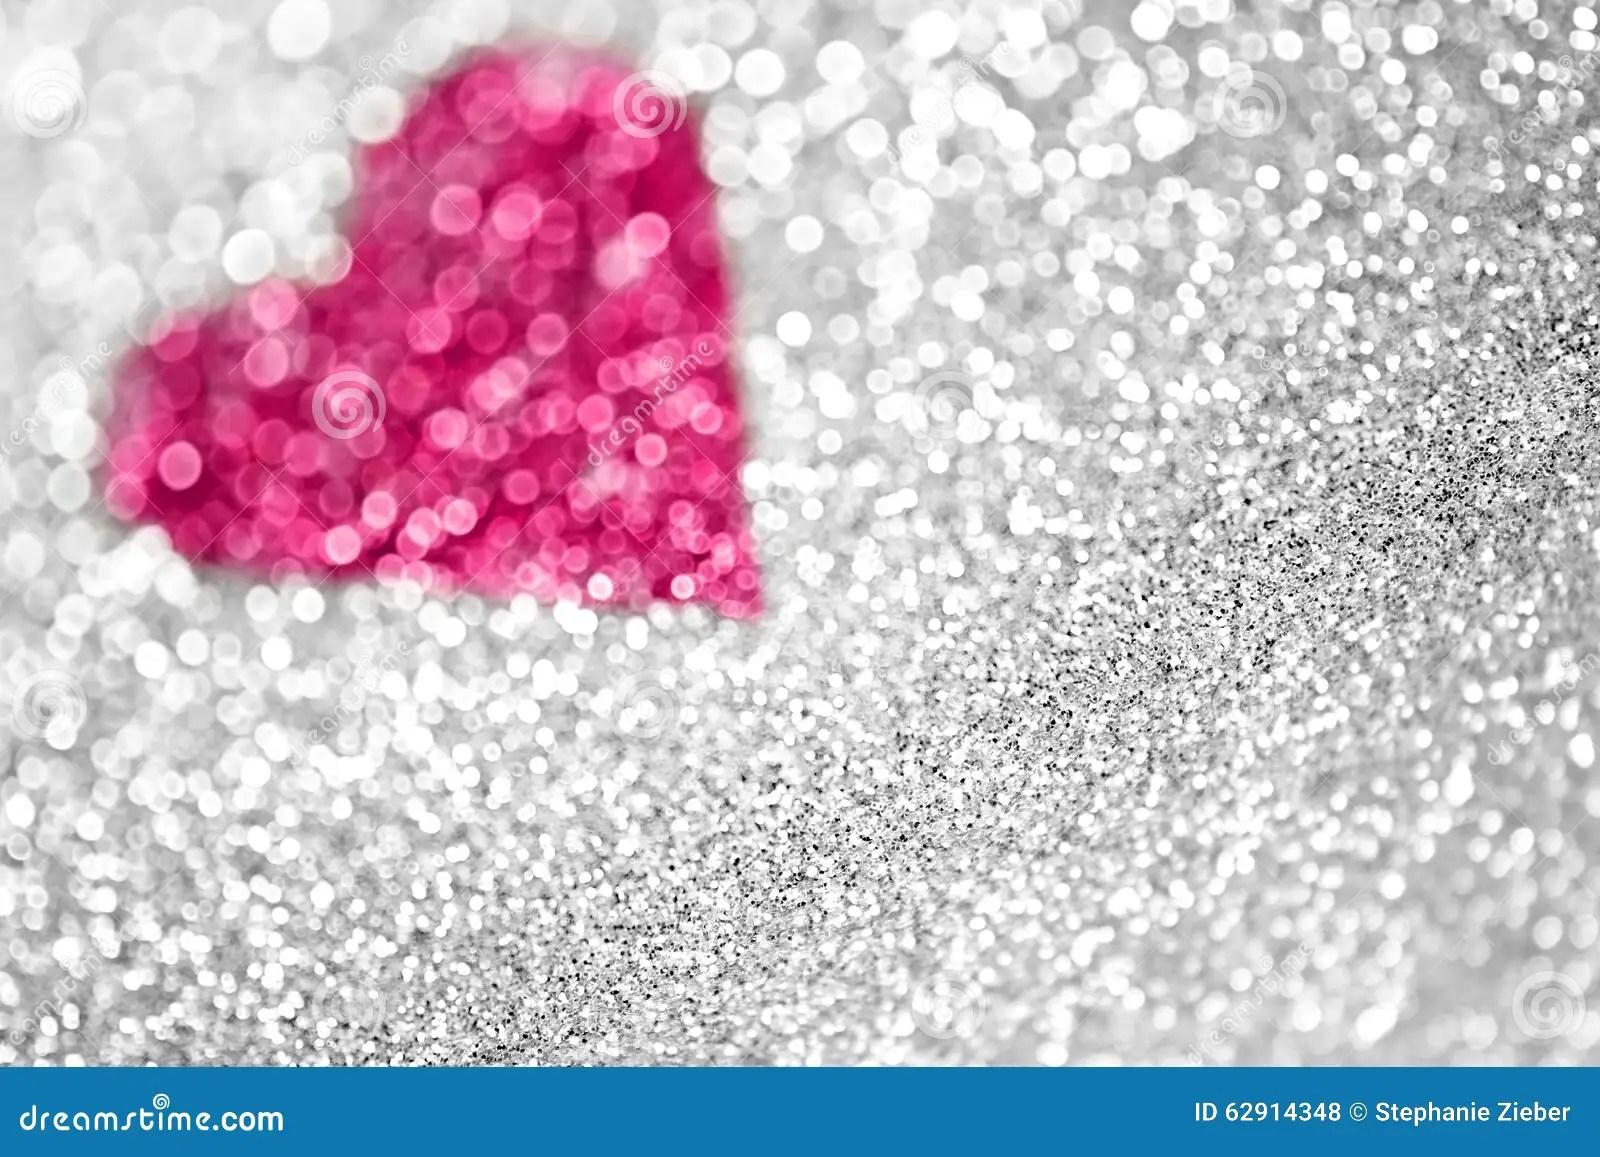 Glitter 3d Wallpaper Pink Glitter Fairy Lights Background Stock Photo Image